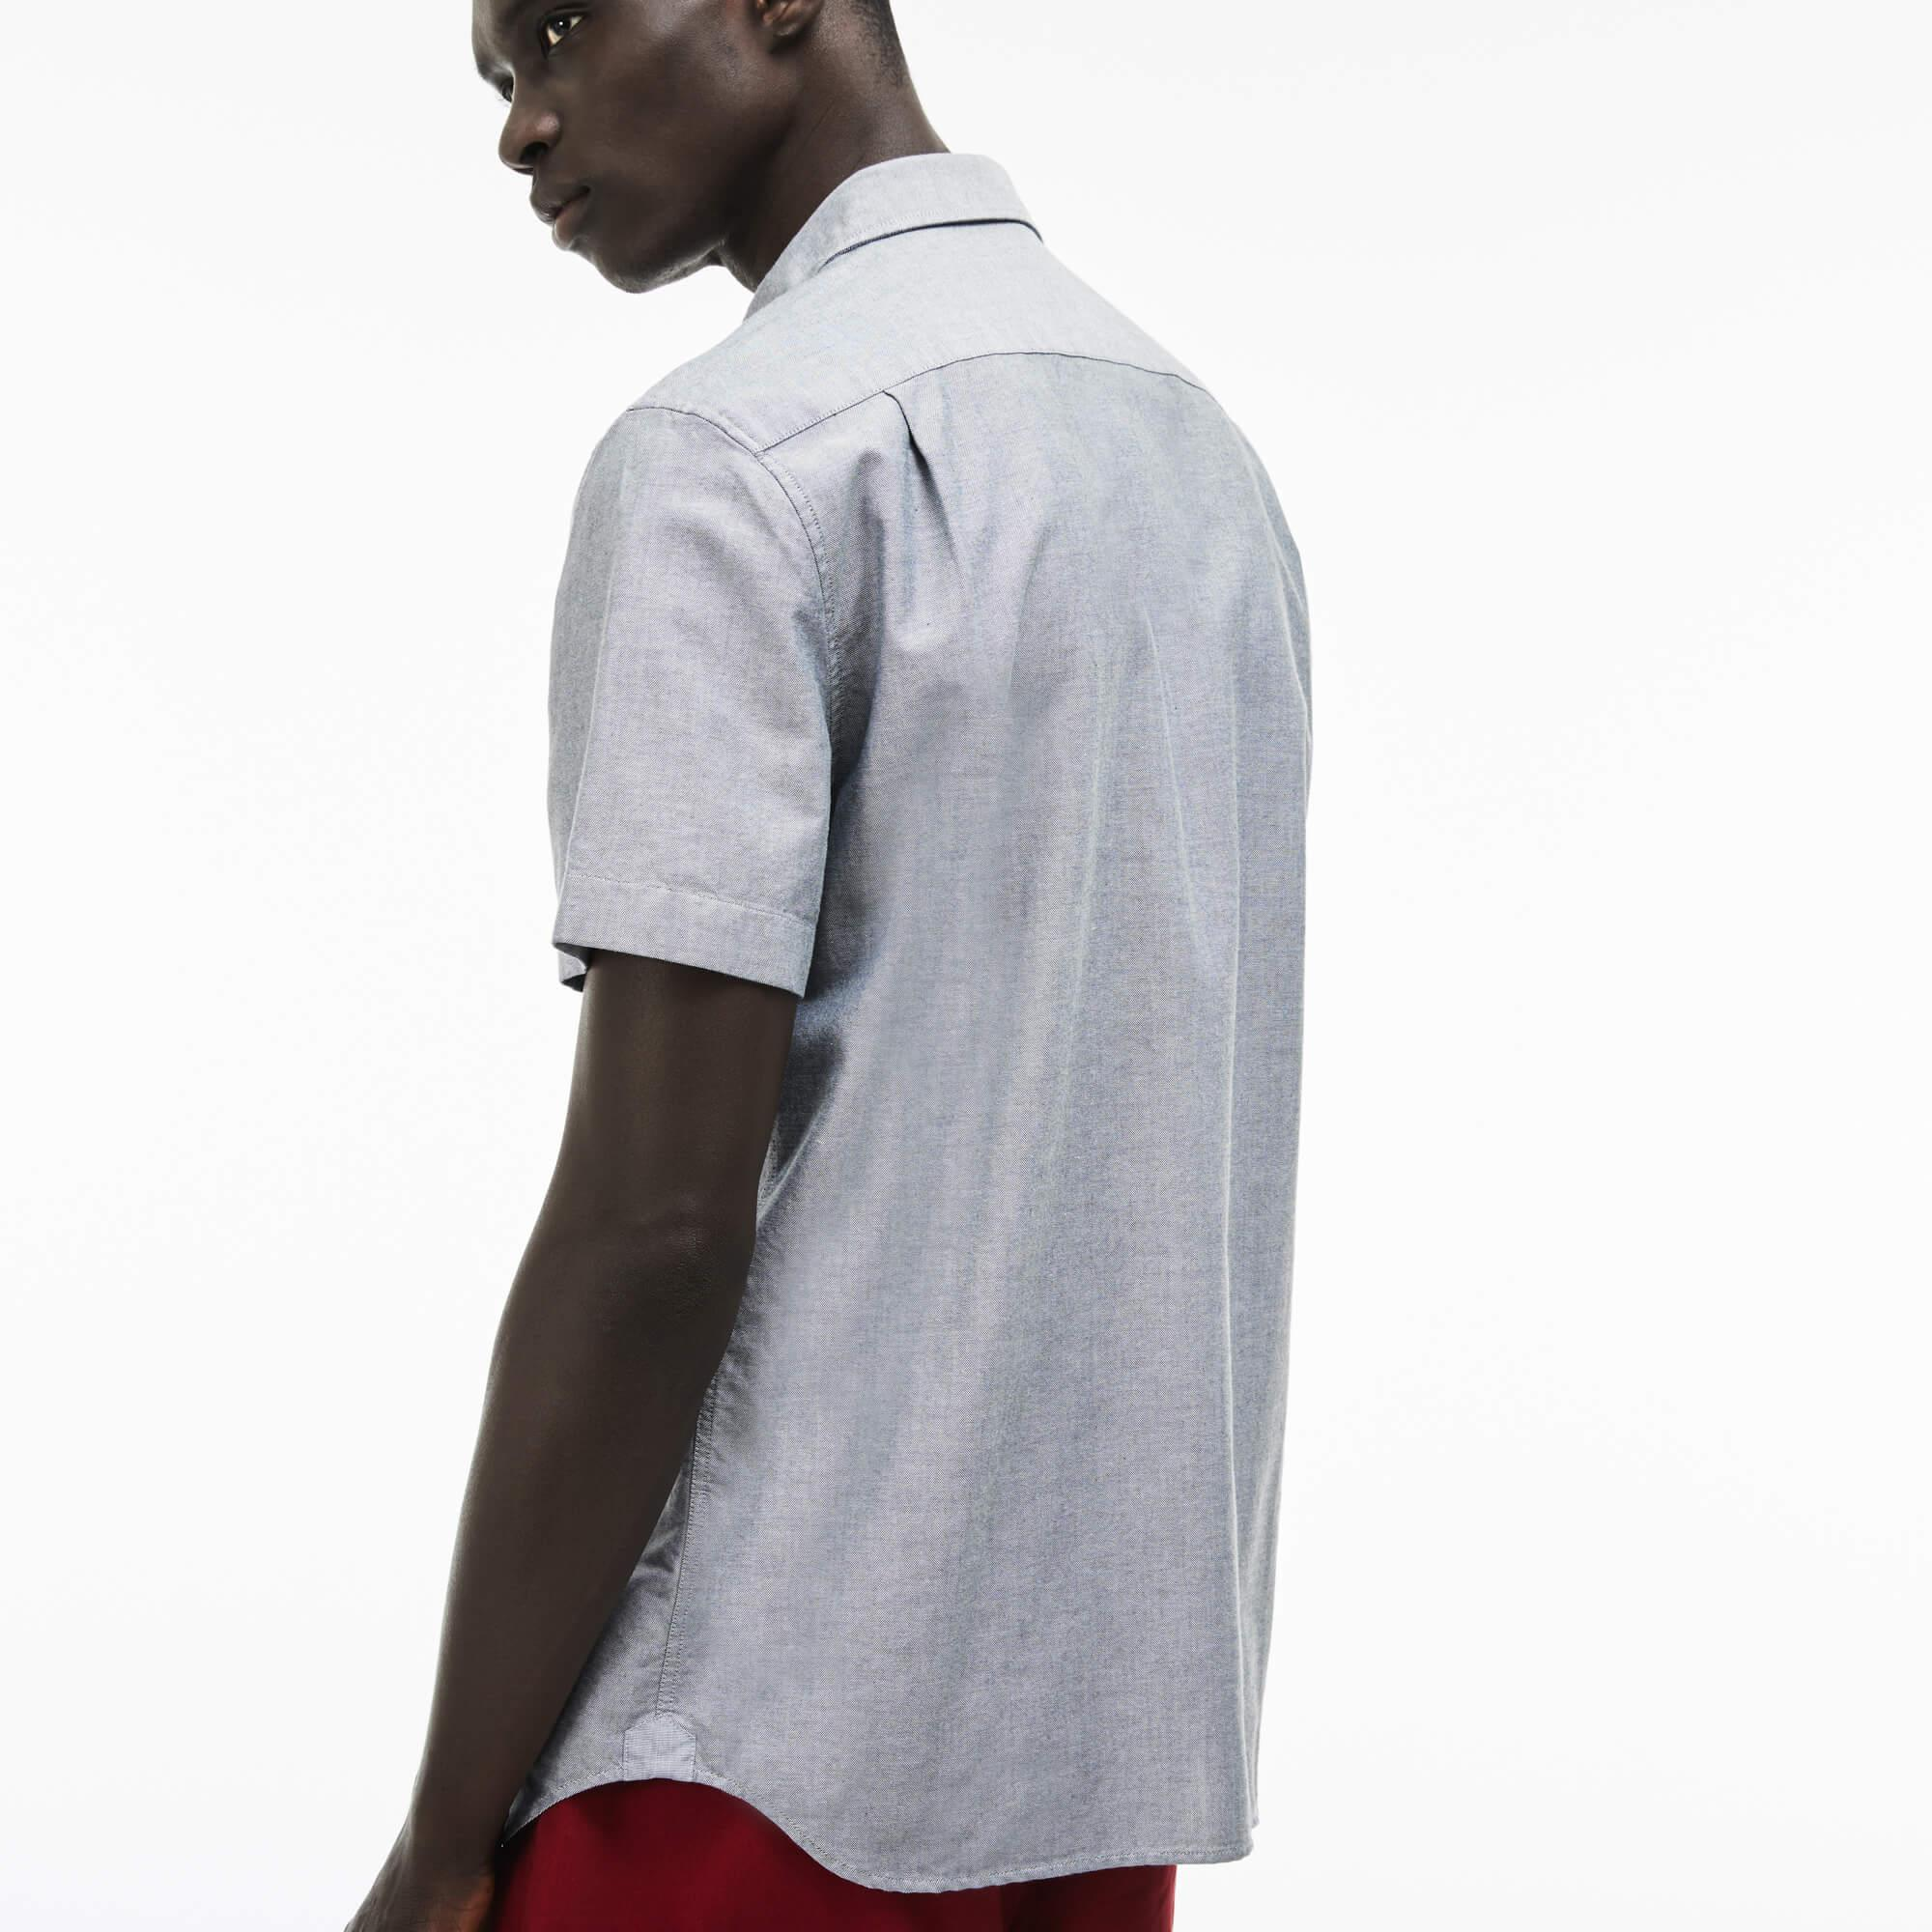 Lacoste Erkek Slim Fit Gri Kısa Kollu Gömlek